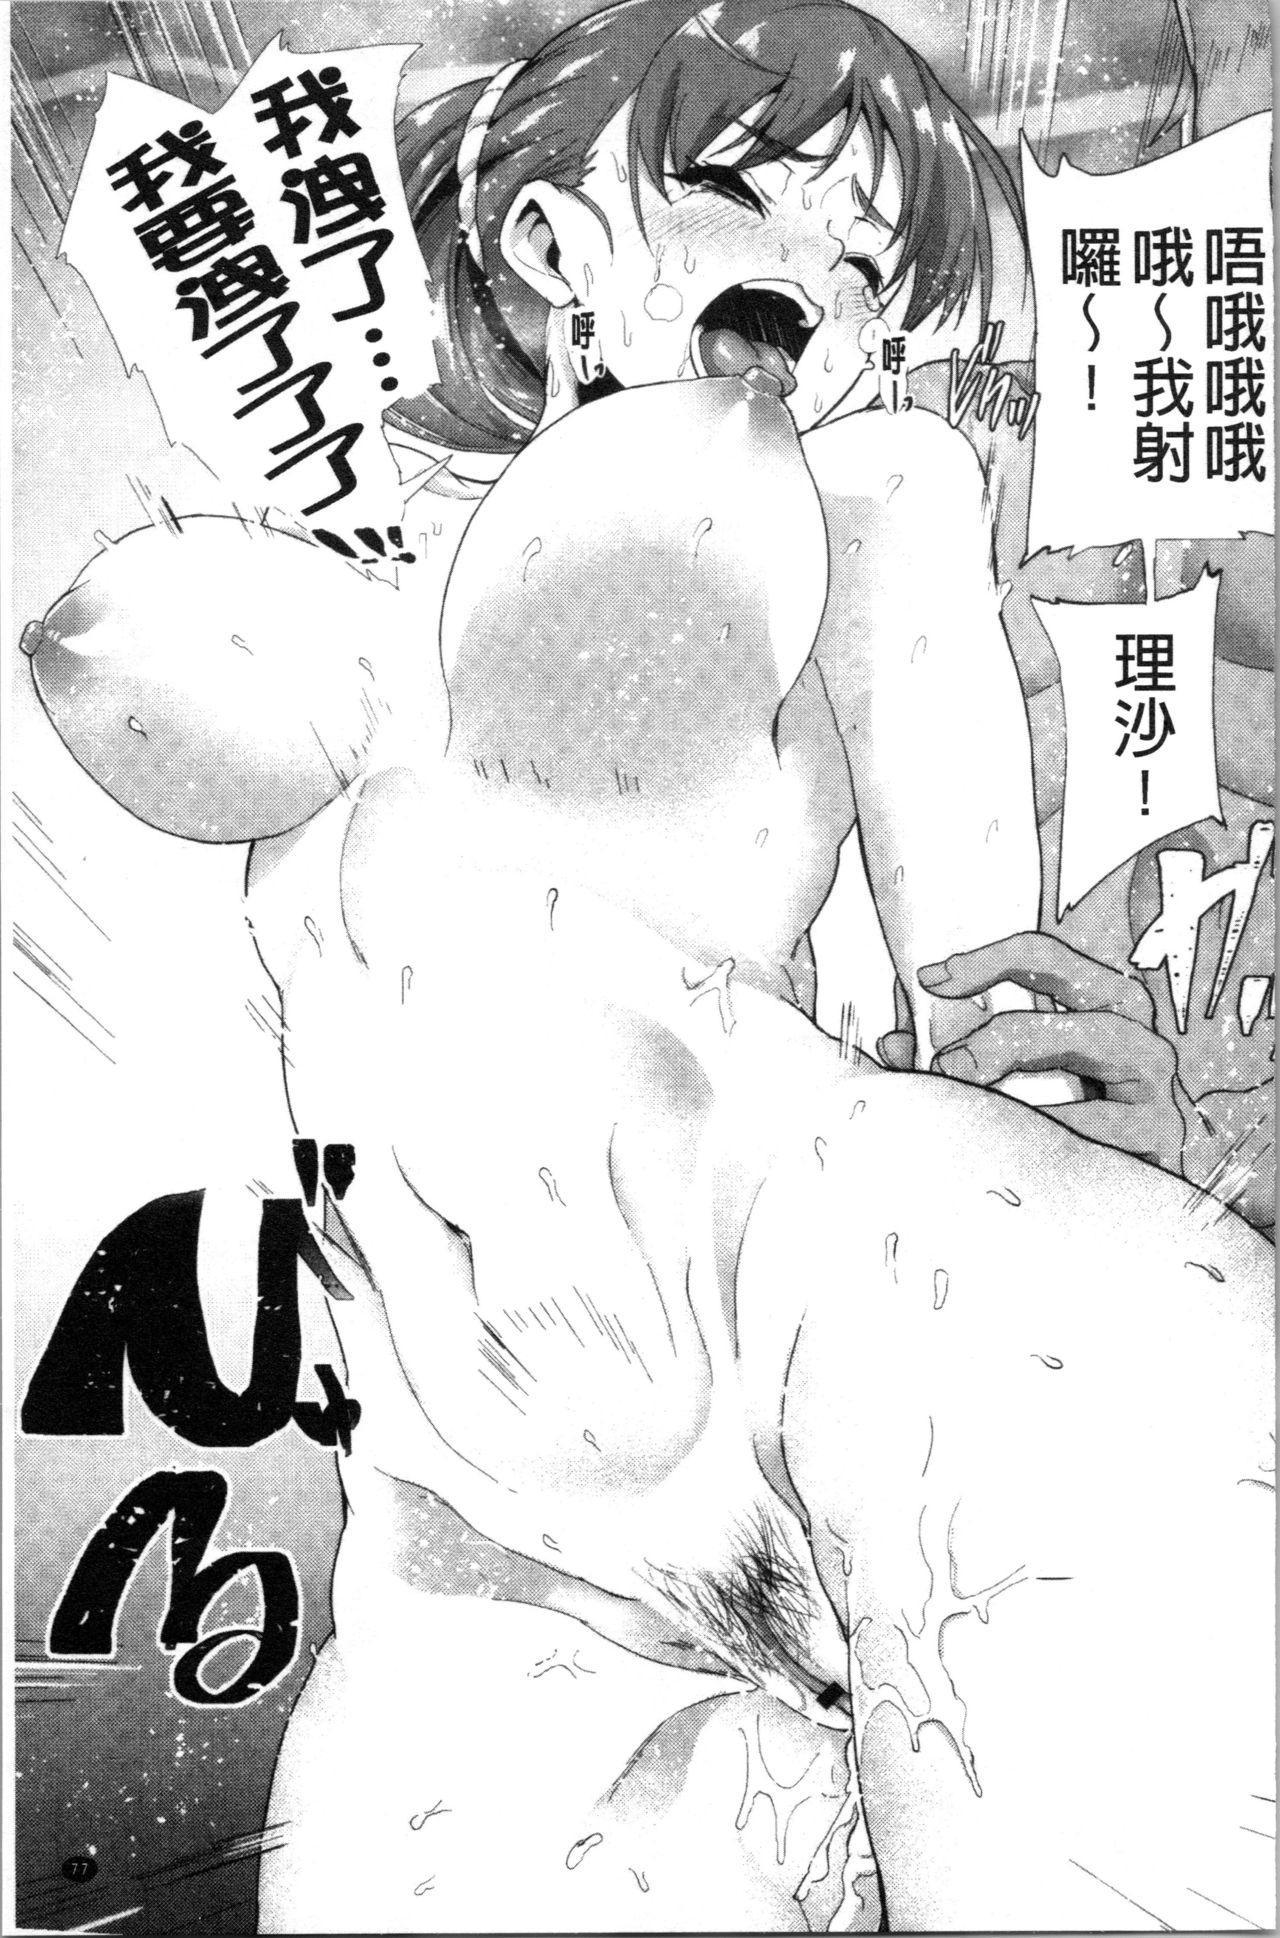 Kanojo ga SEX ni nare teru wake | 女友對激情性愛變很習慣的理由 79